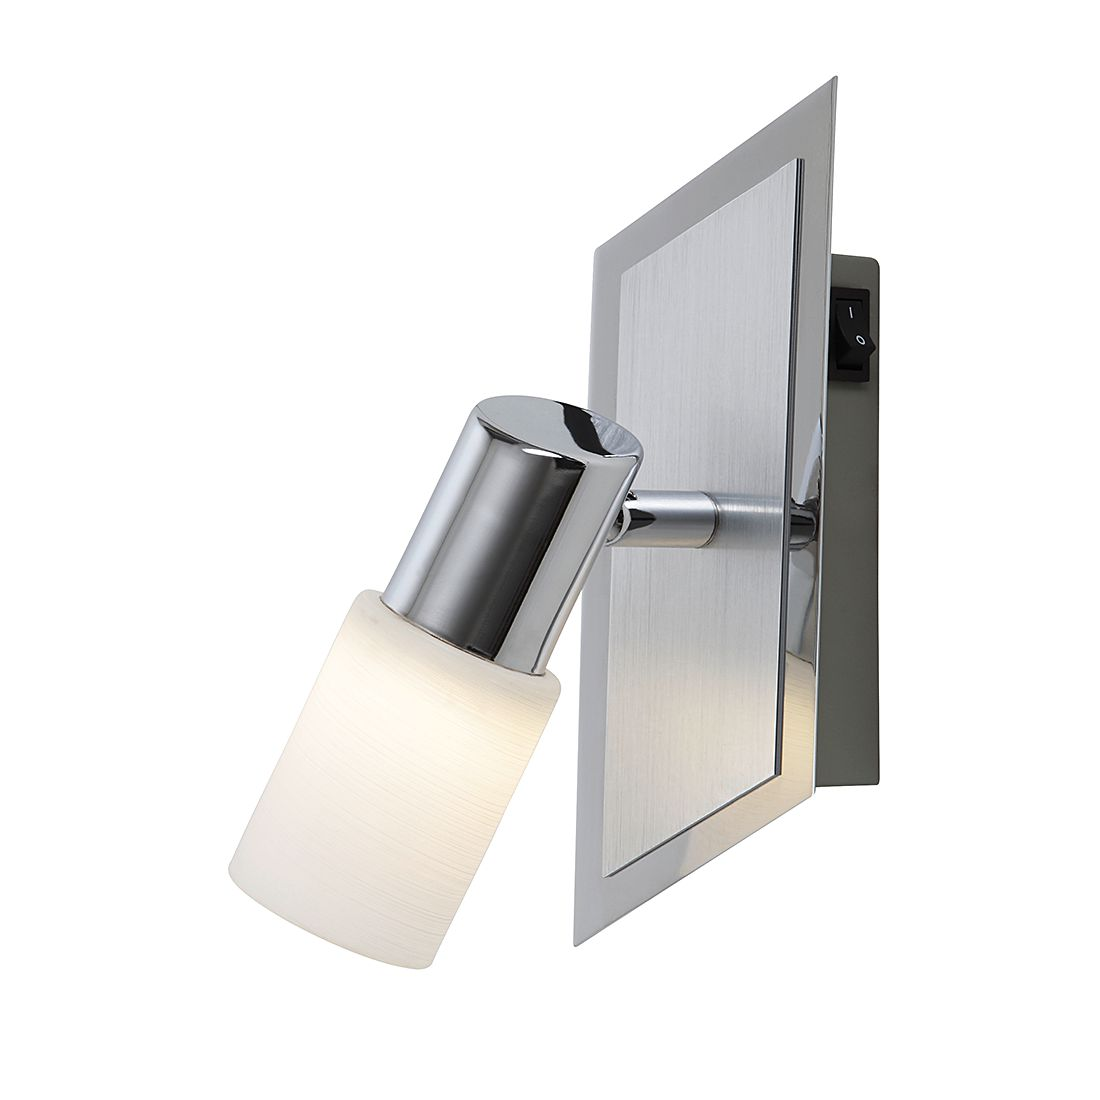 home24 LED-Strahler   Lampen > Strahler und Systeme > Strahler und Spots   Silber   Metall   Trio